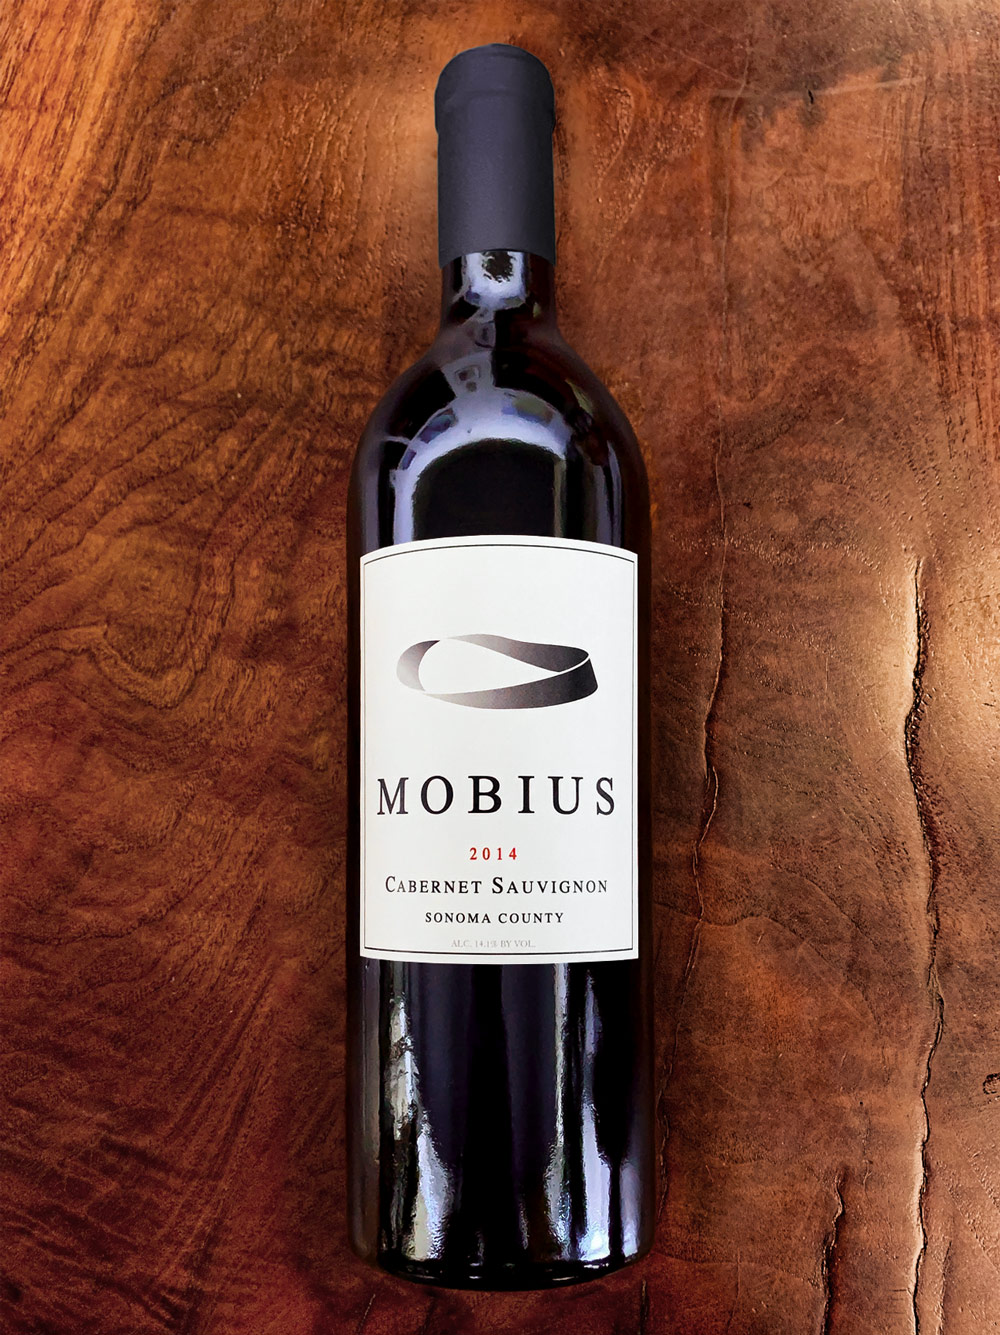 2014 Mobius Sonoma County Cabernet